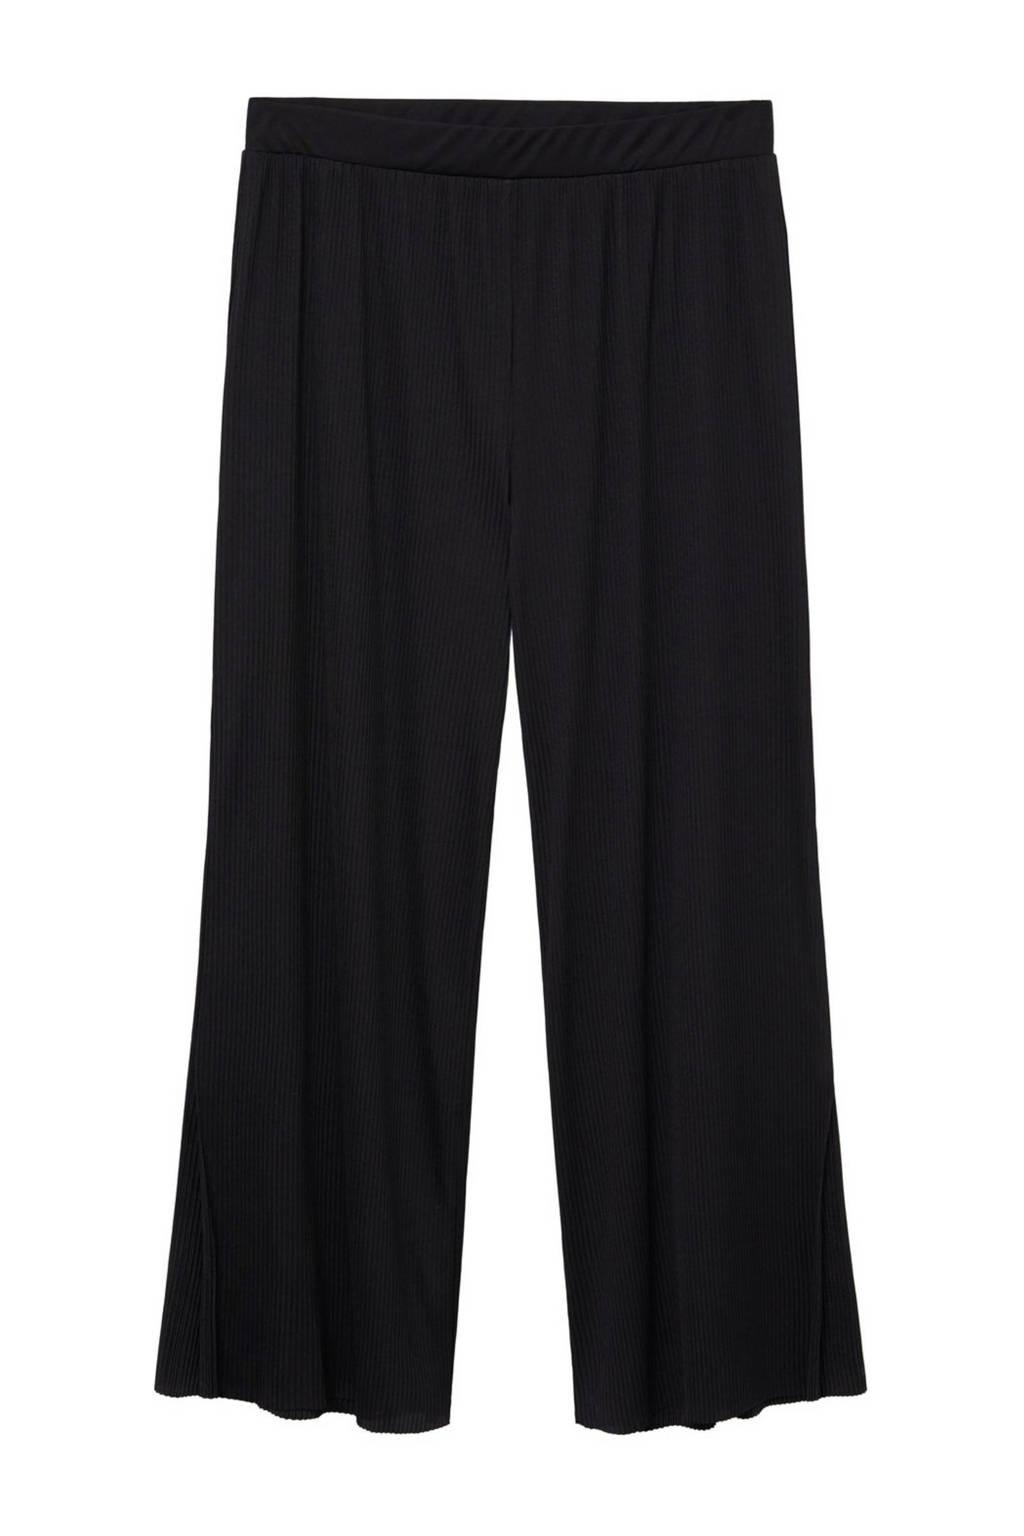 Violeta by Mango loose fit broek zwart, Zwart